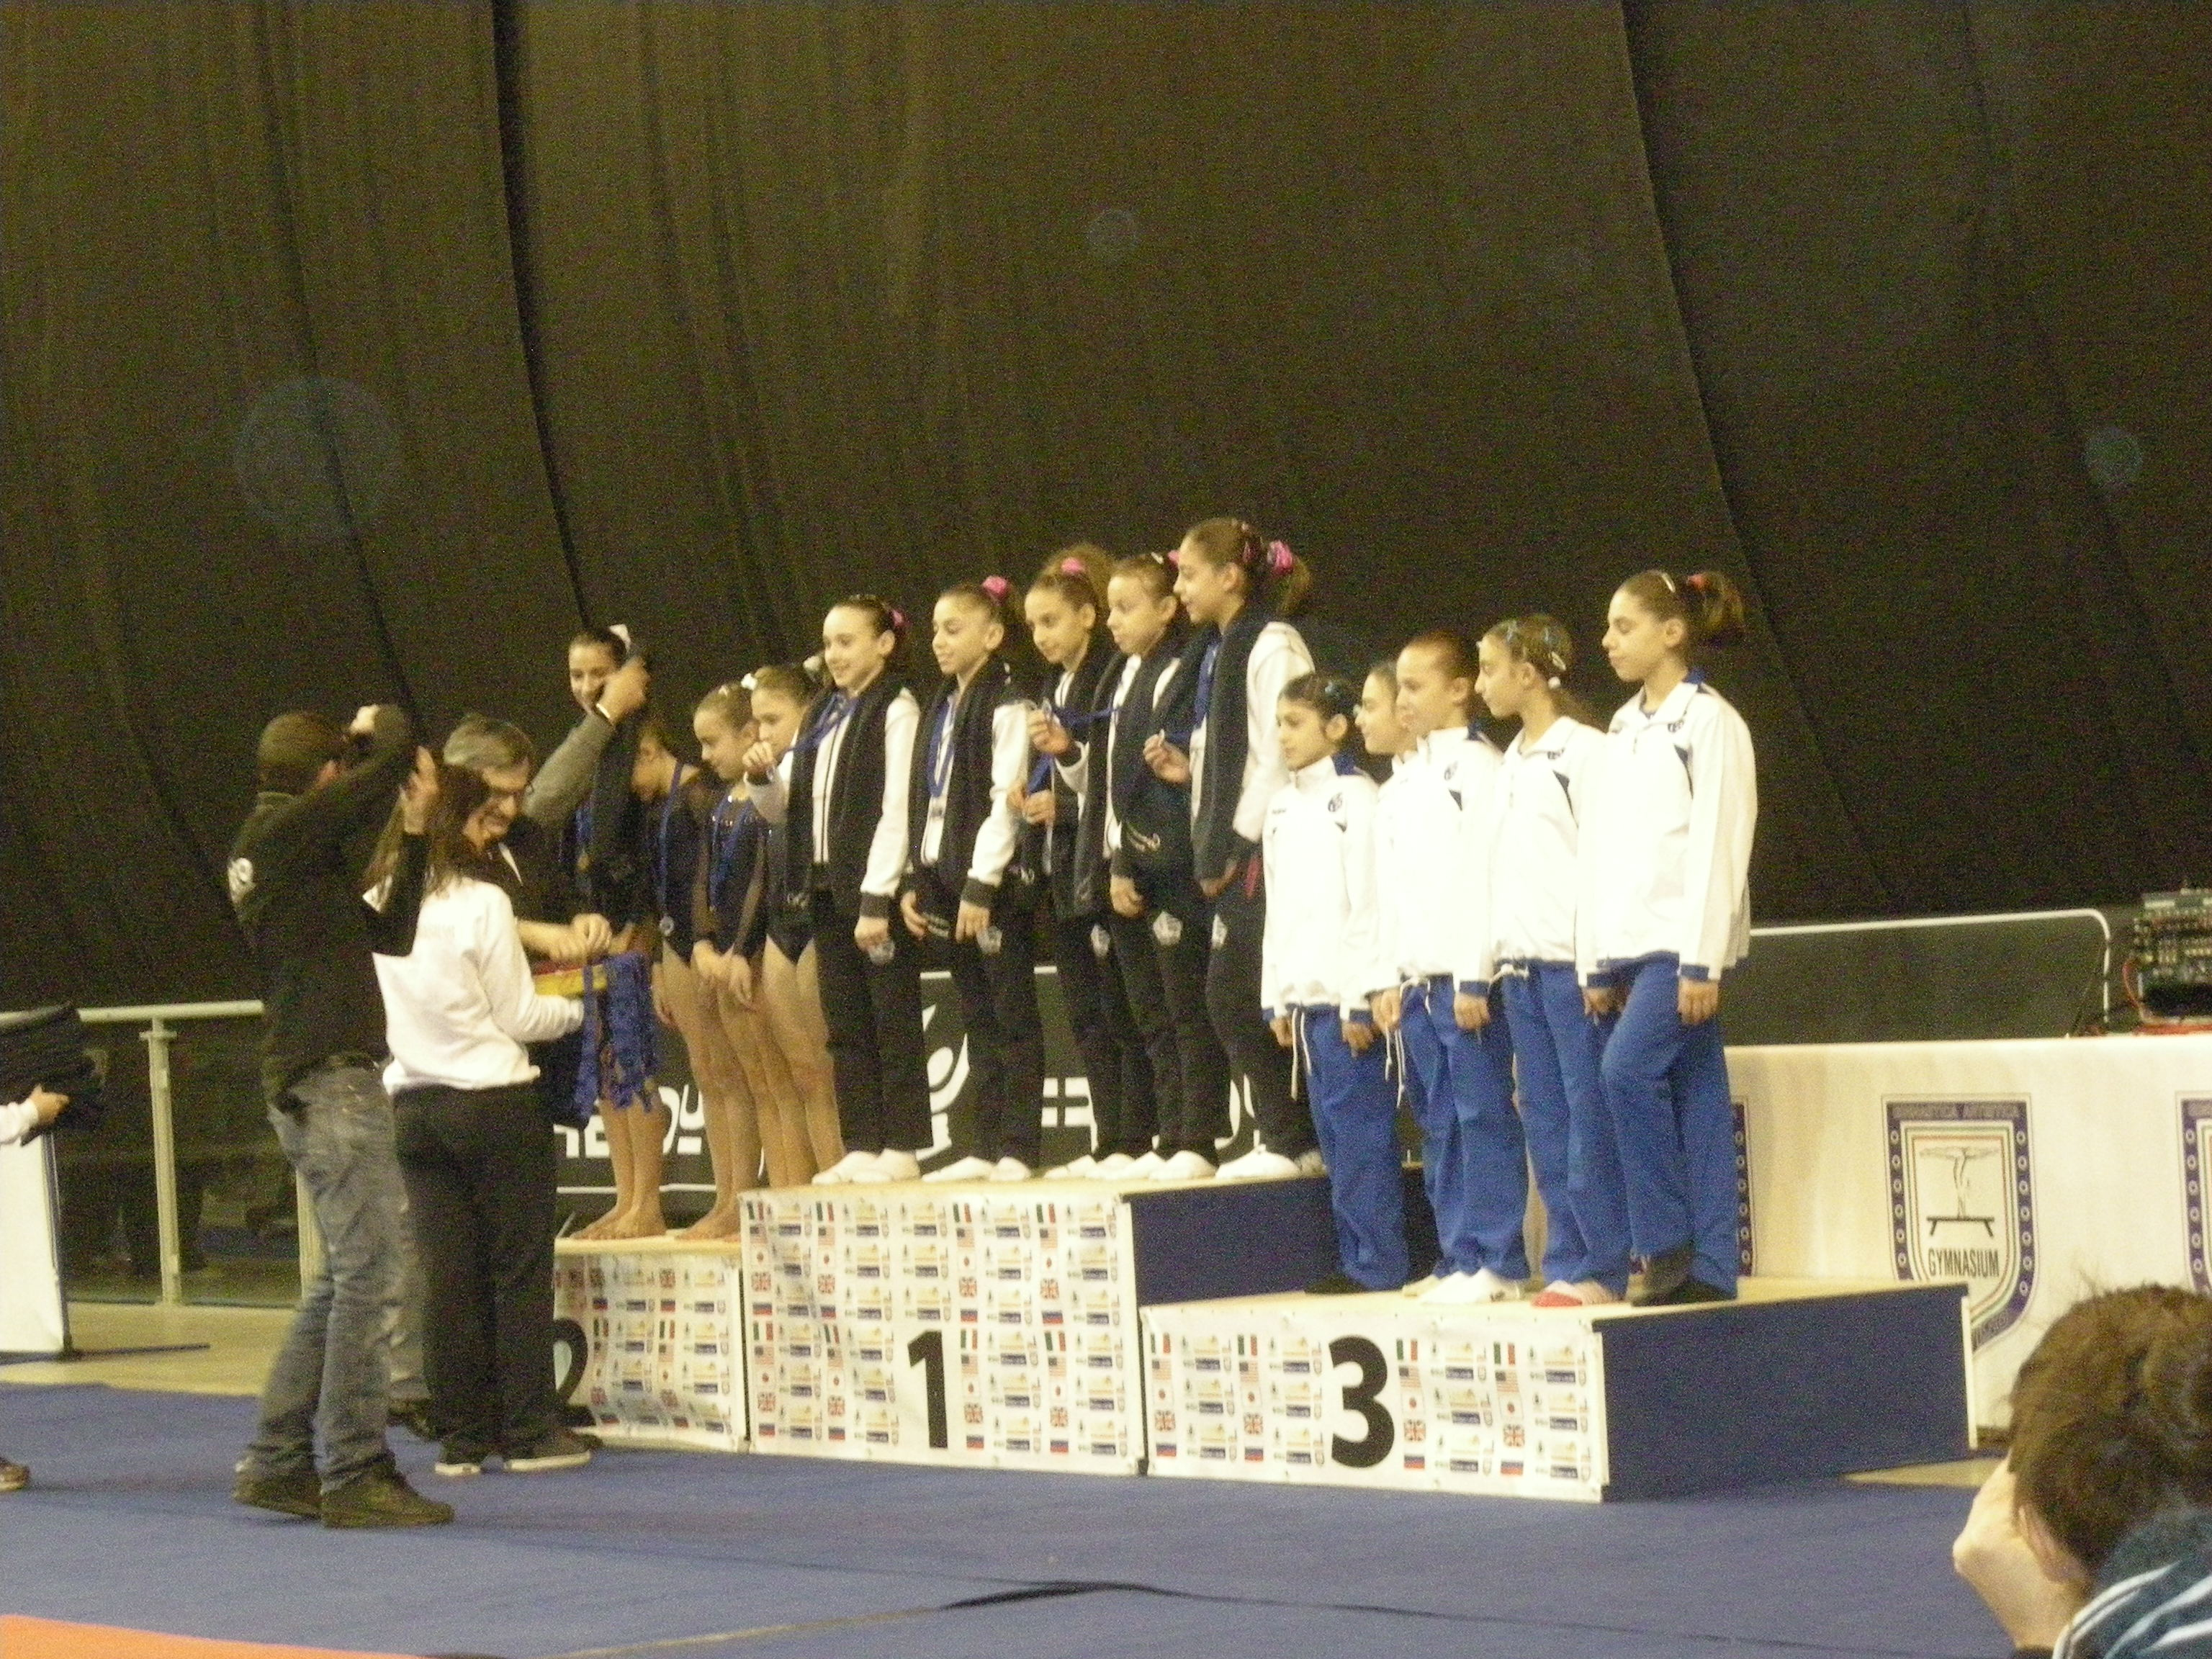 Campionati italiani C1 Atletica 75 3° posto